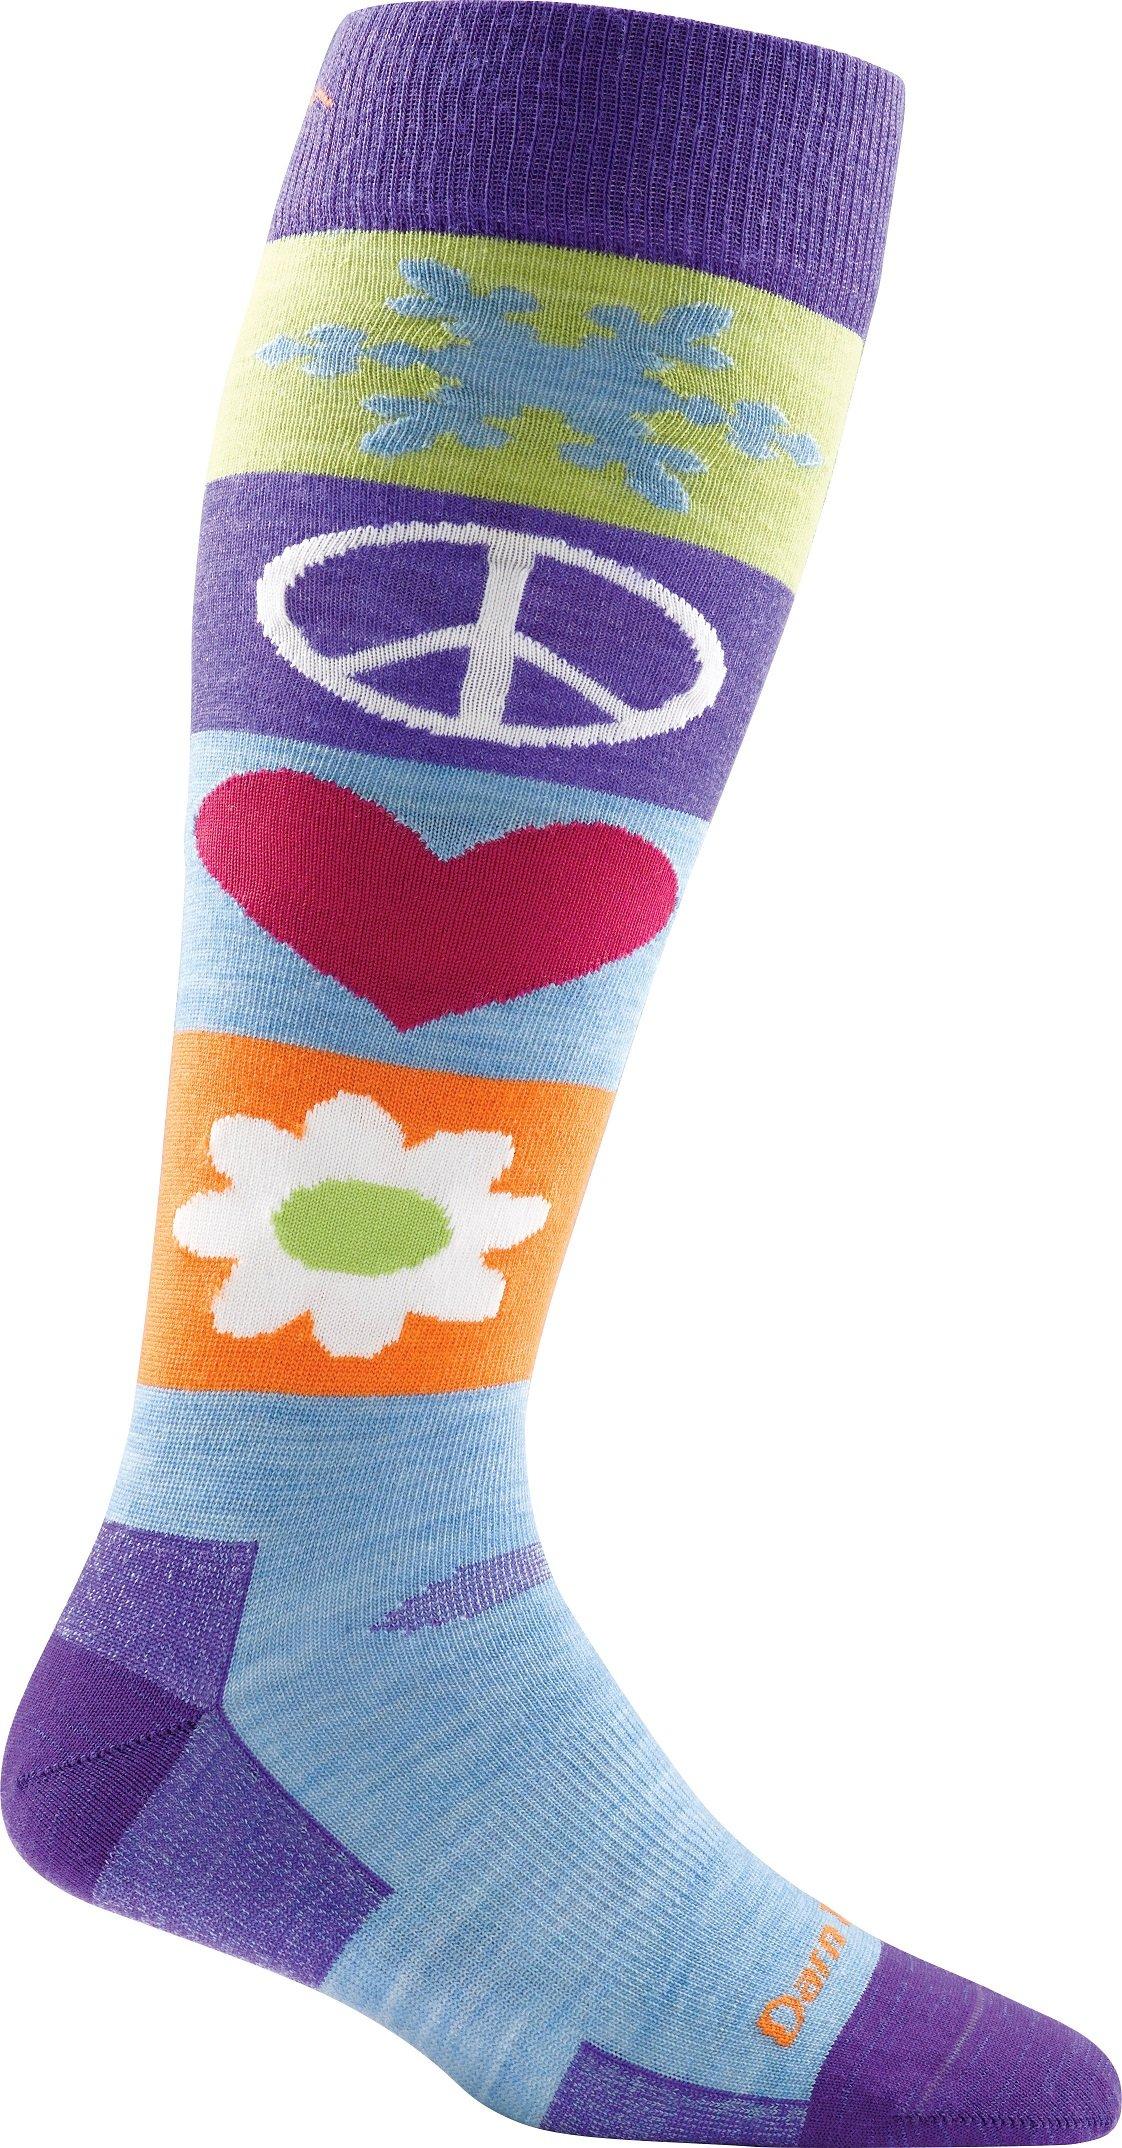 Darn Tough Peace Love Snow Cushion OTC Sock - Women's Majesty Small